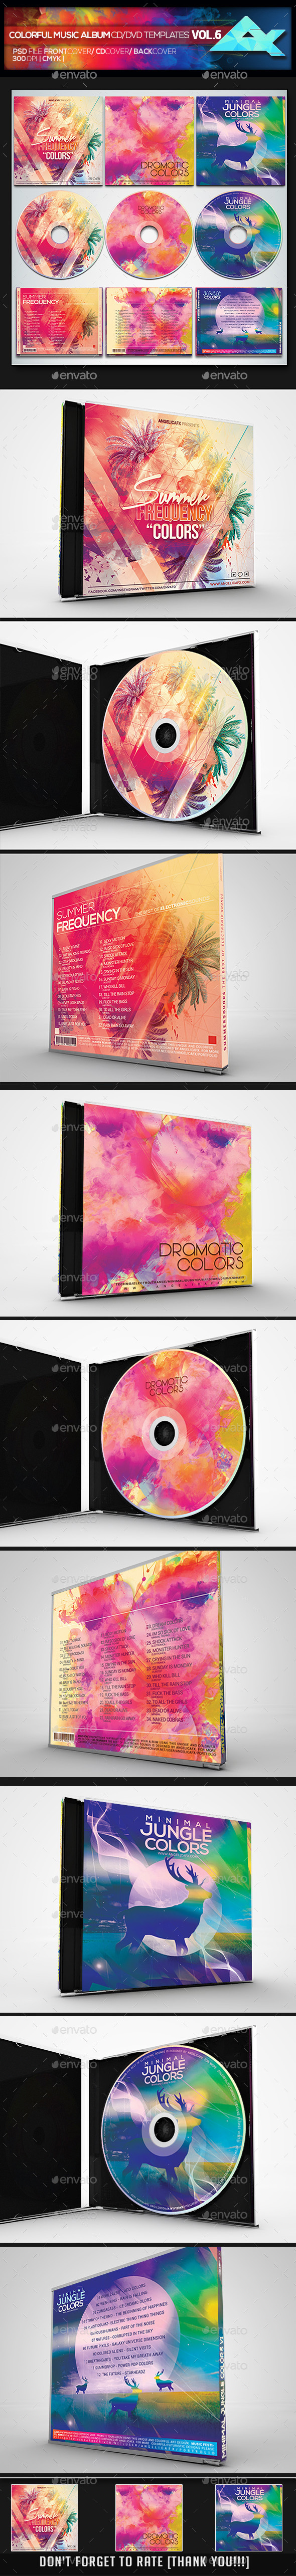 Colorful CD/DVD Album Covers Bundle Vol. 6 - CD & DVD Artwork Print Templates